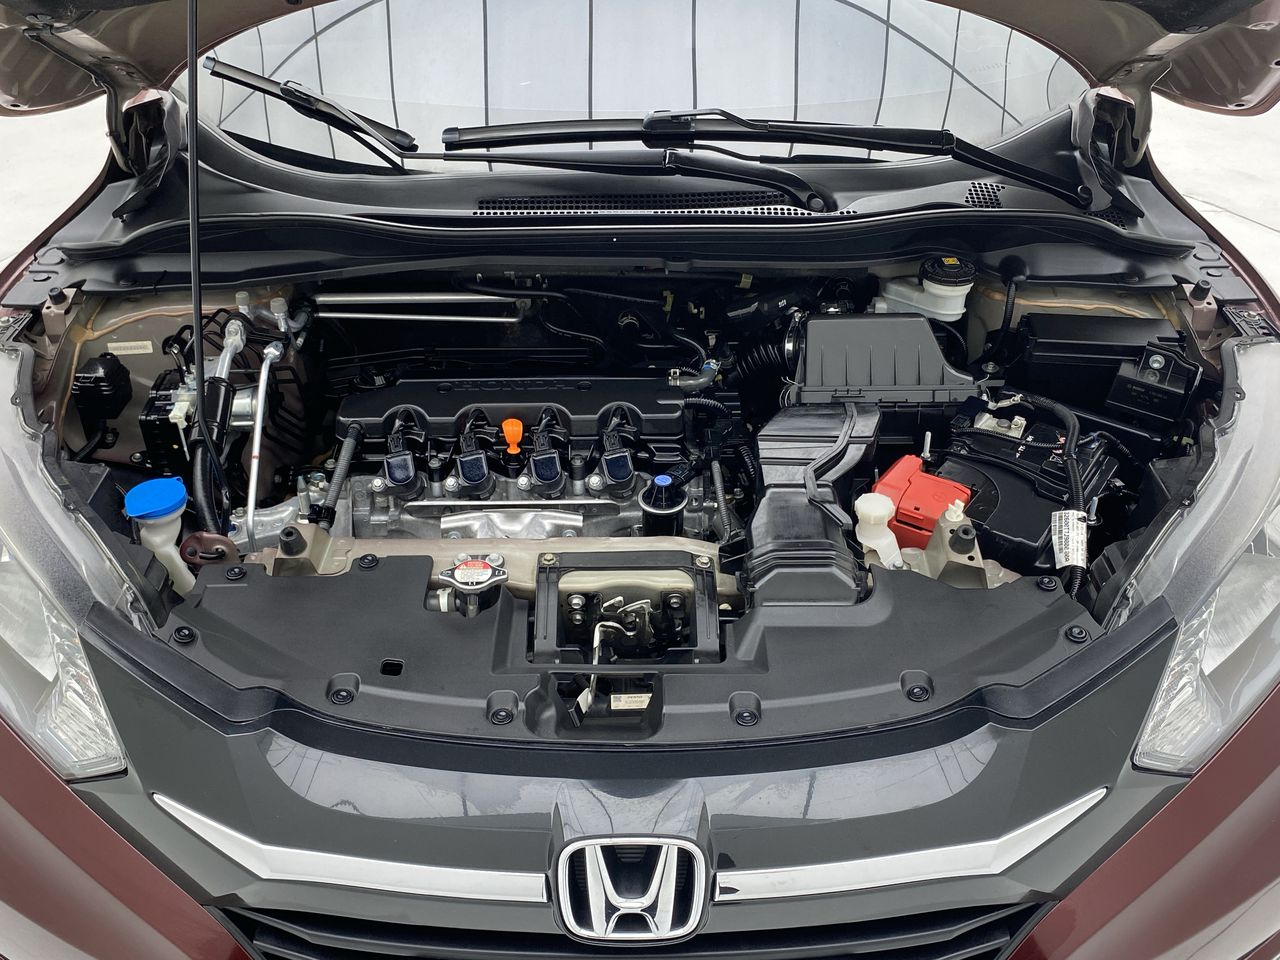 HR-V LX 1.8 Flexone 16V 5p Aut.